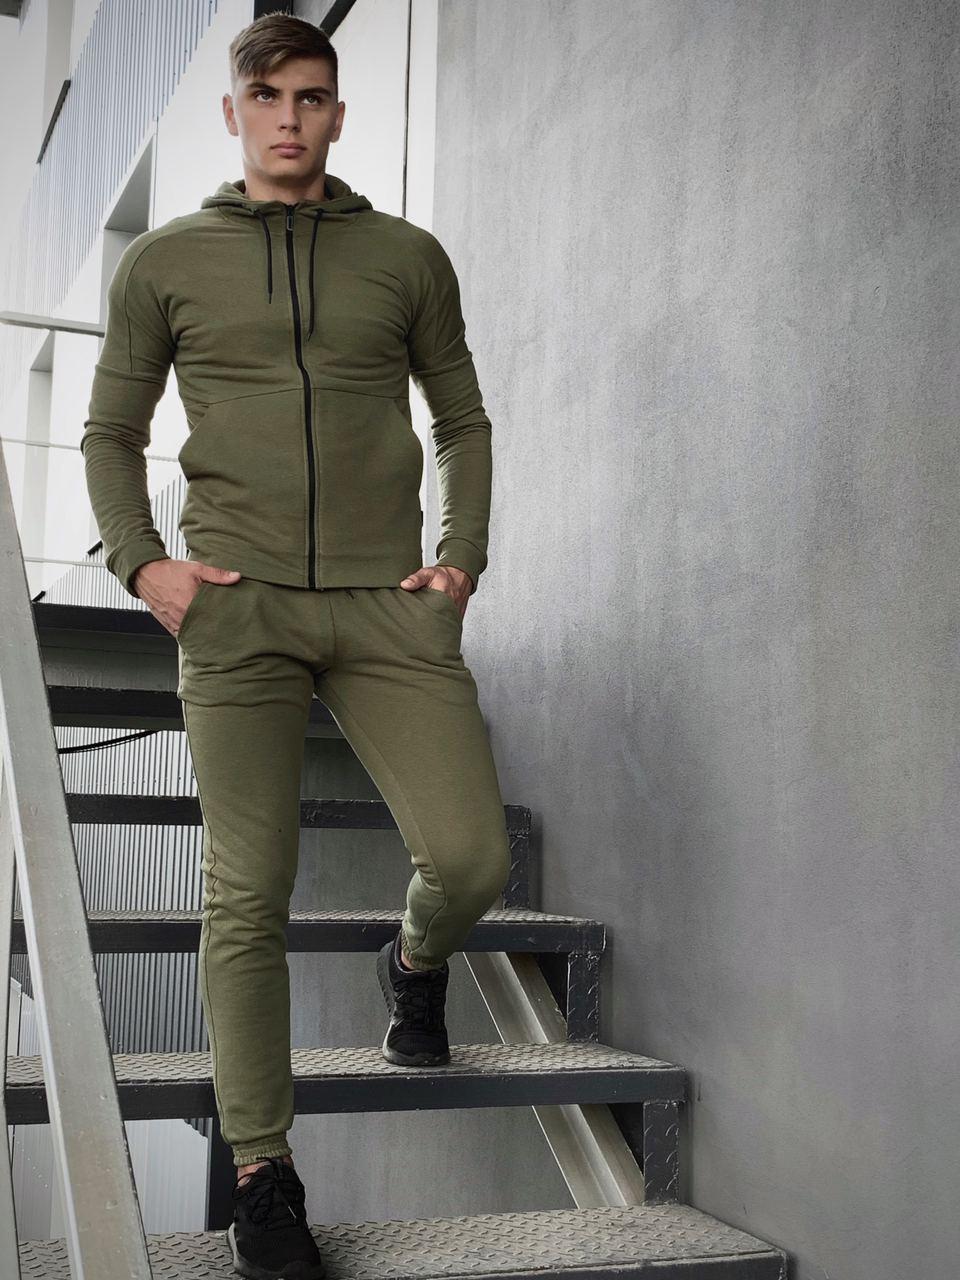 Костюм мужской спортивный Cosmo Intruder хаки Кофта толстовка + штаны